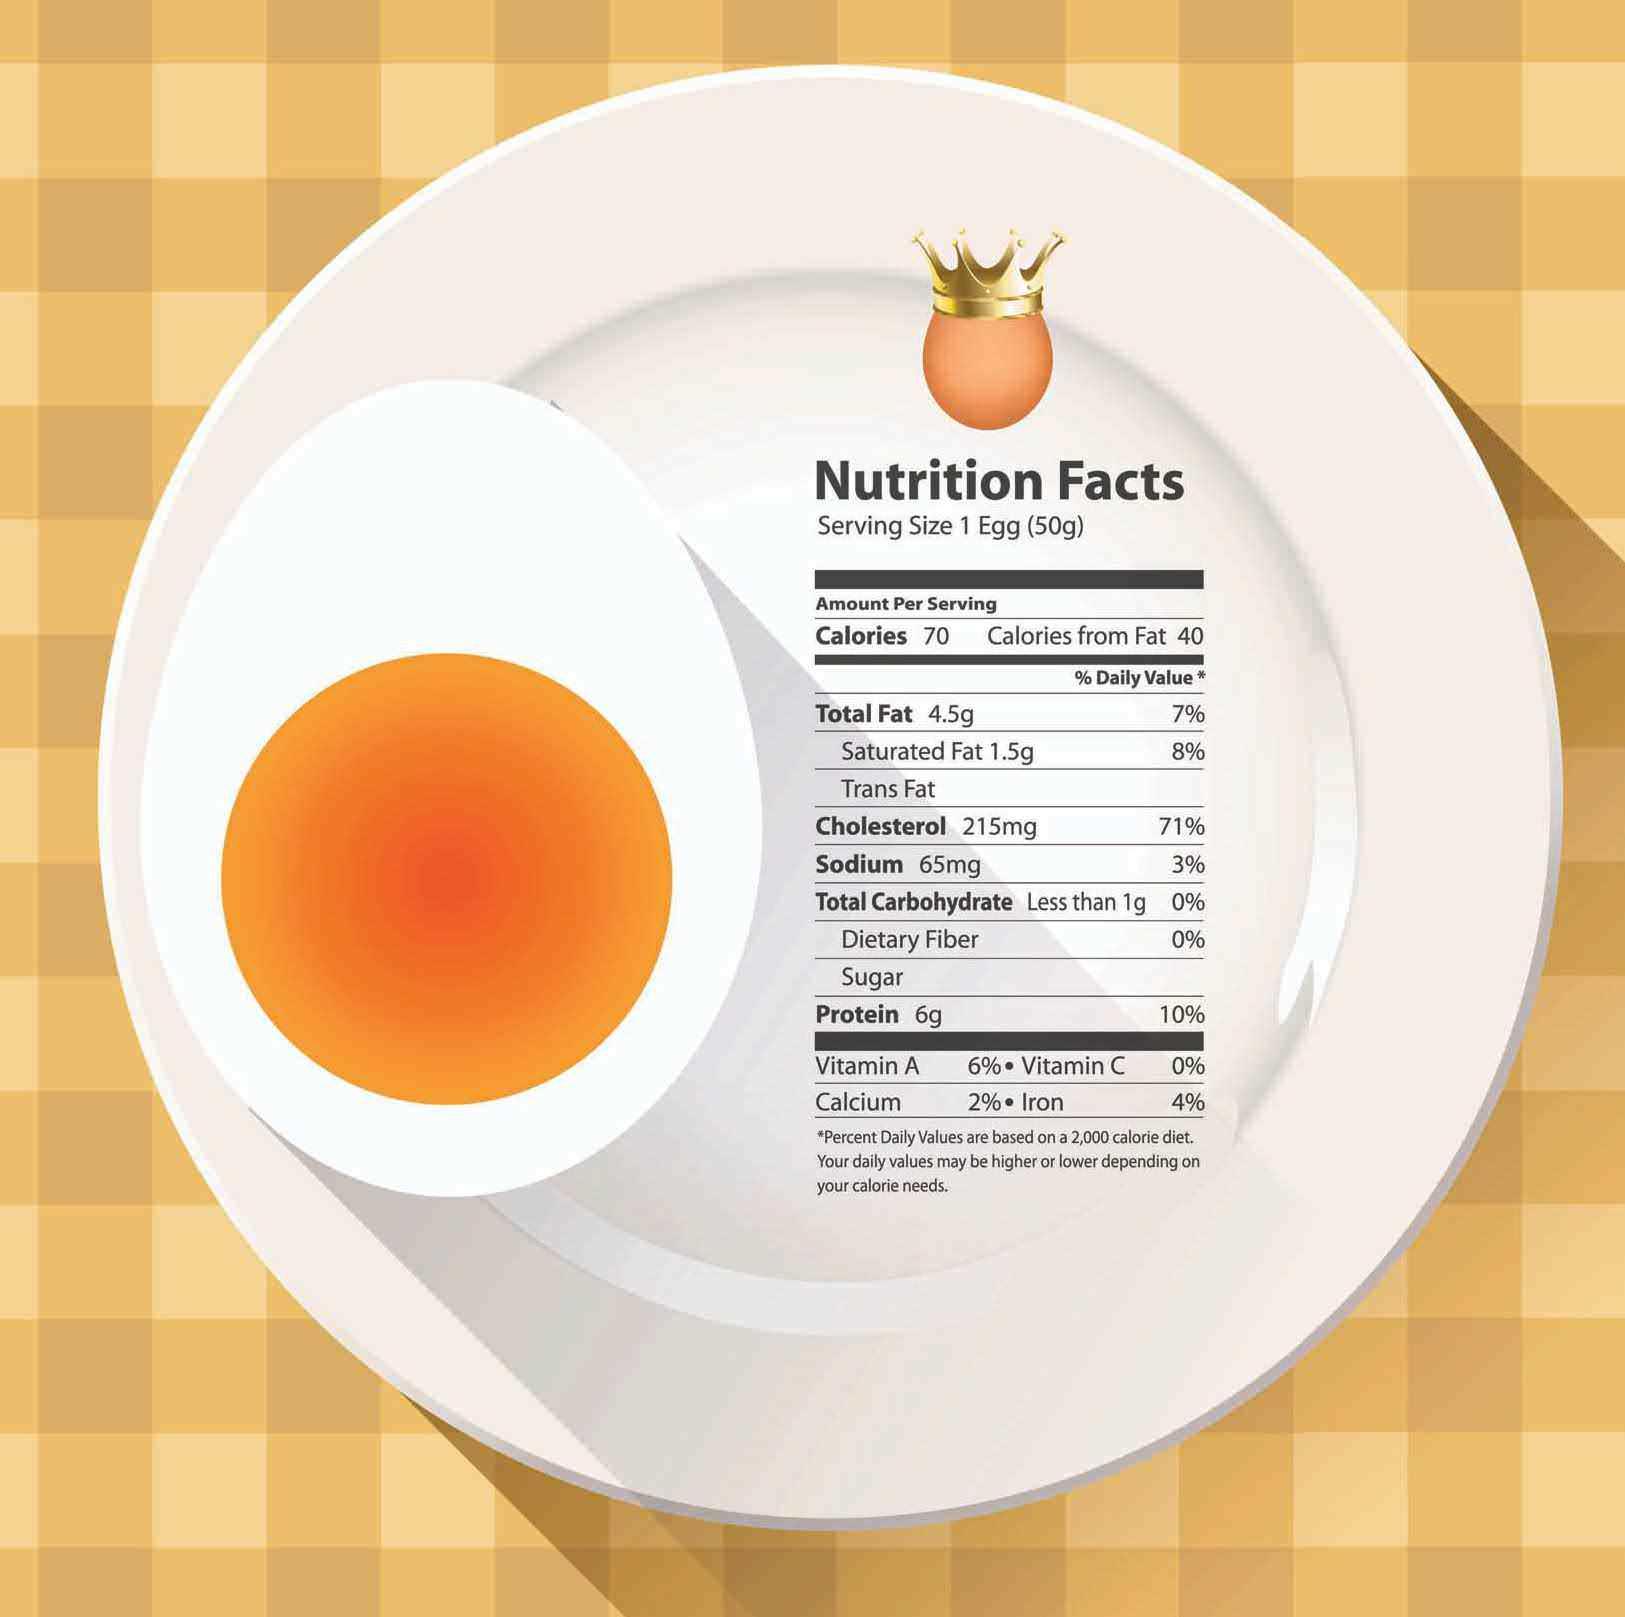 11 Health Benefits Of Eggs